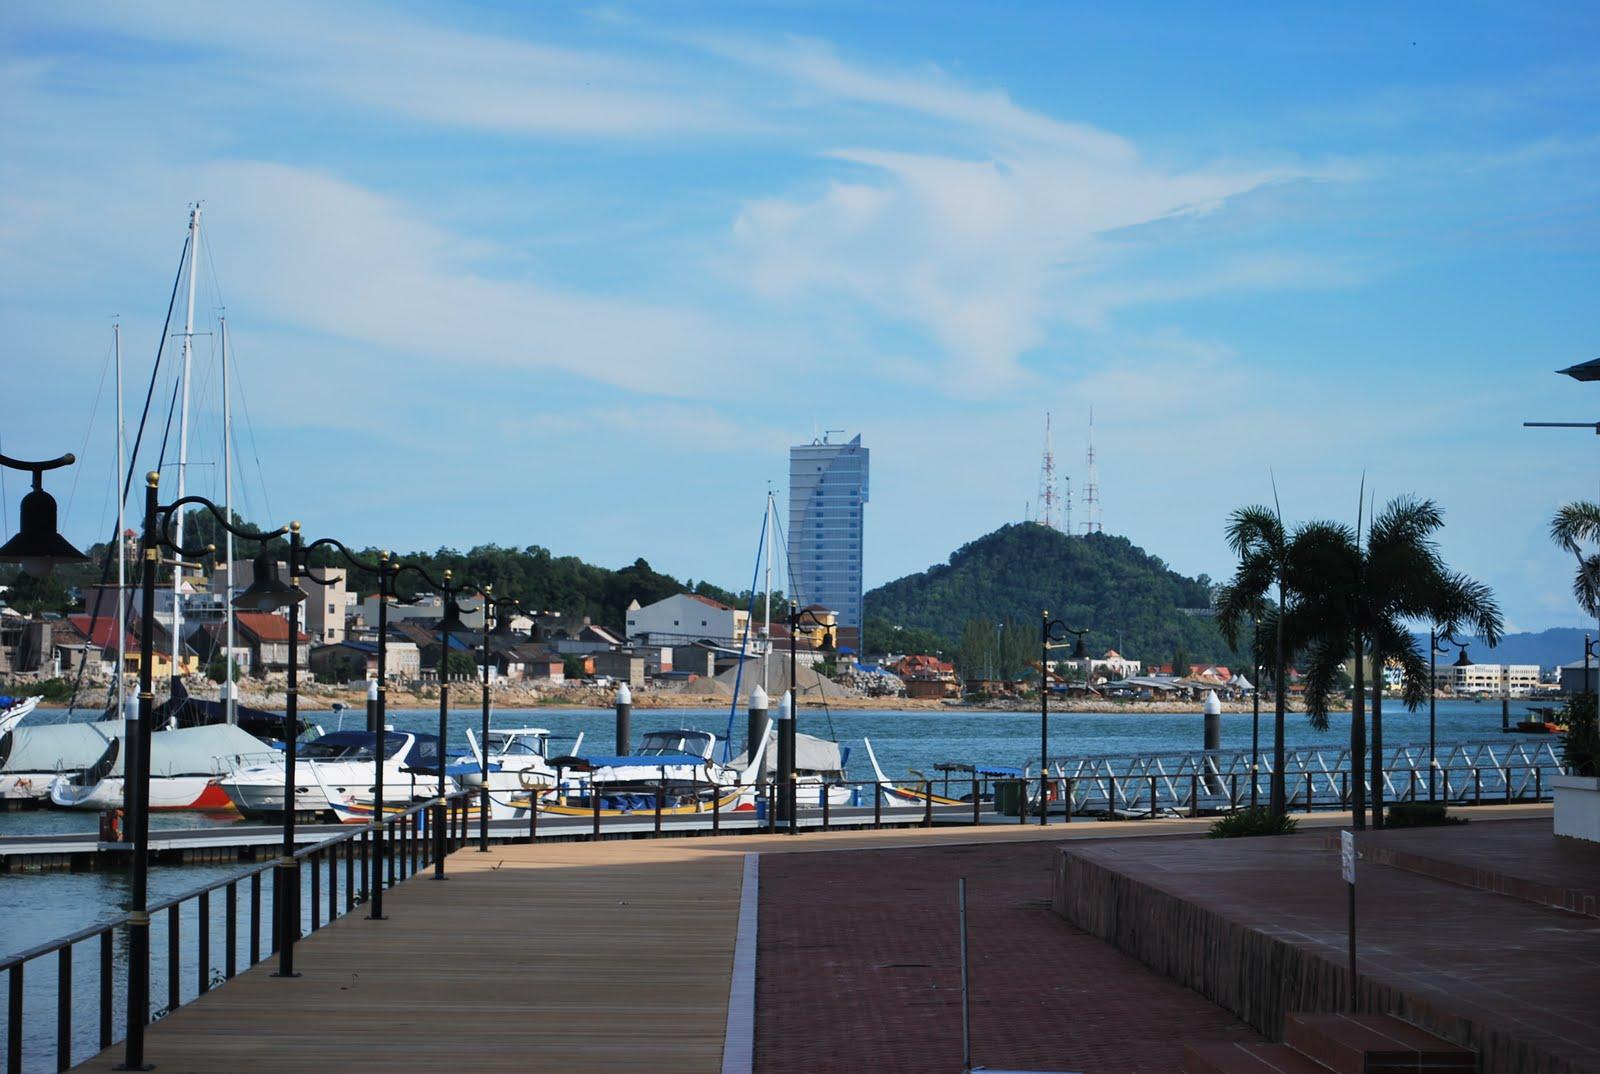 Kuala Terengganu Malaysia  City new picture : Terengganu's Touristic Appeal: Kuala Terengganu Waterfront, Malaysia